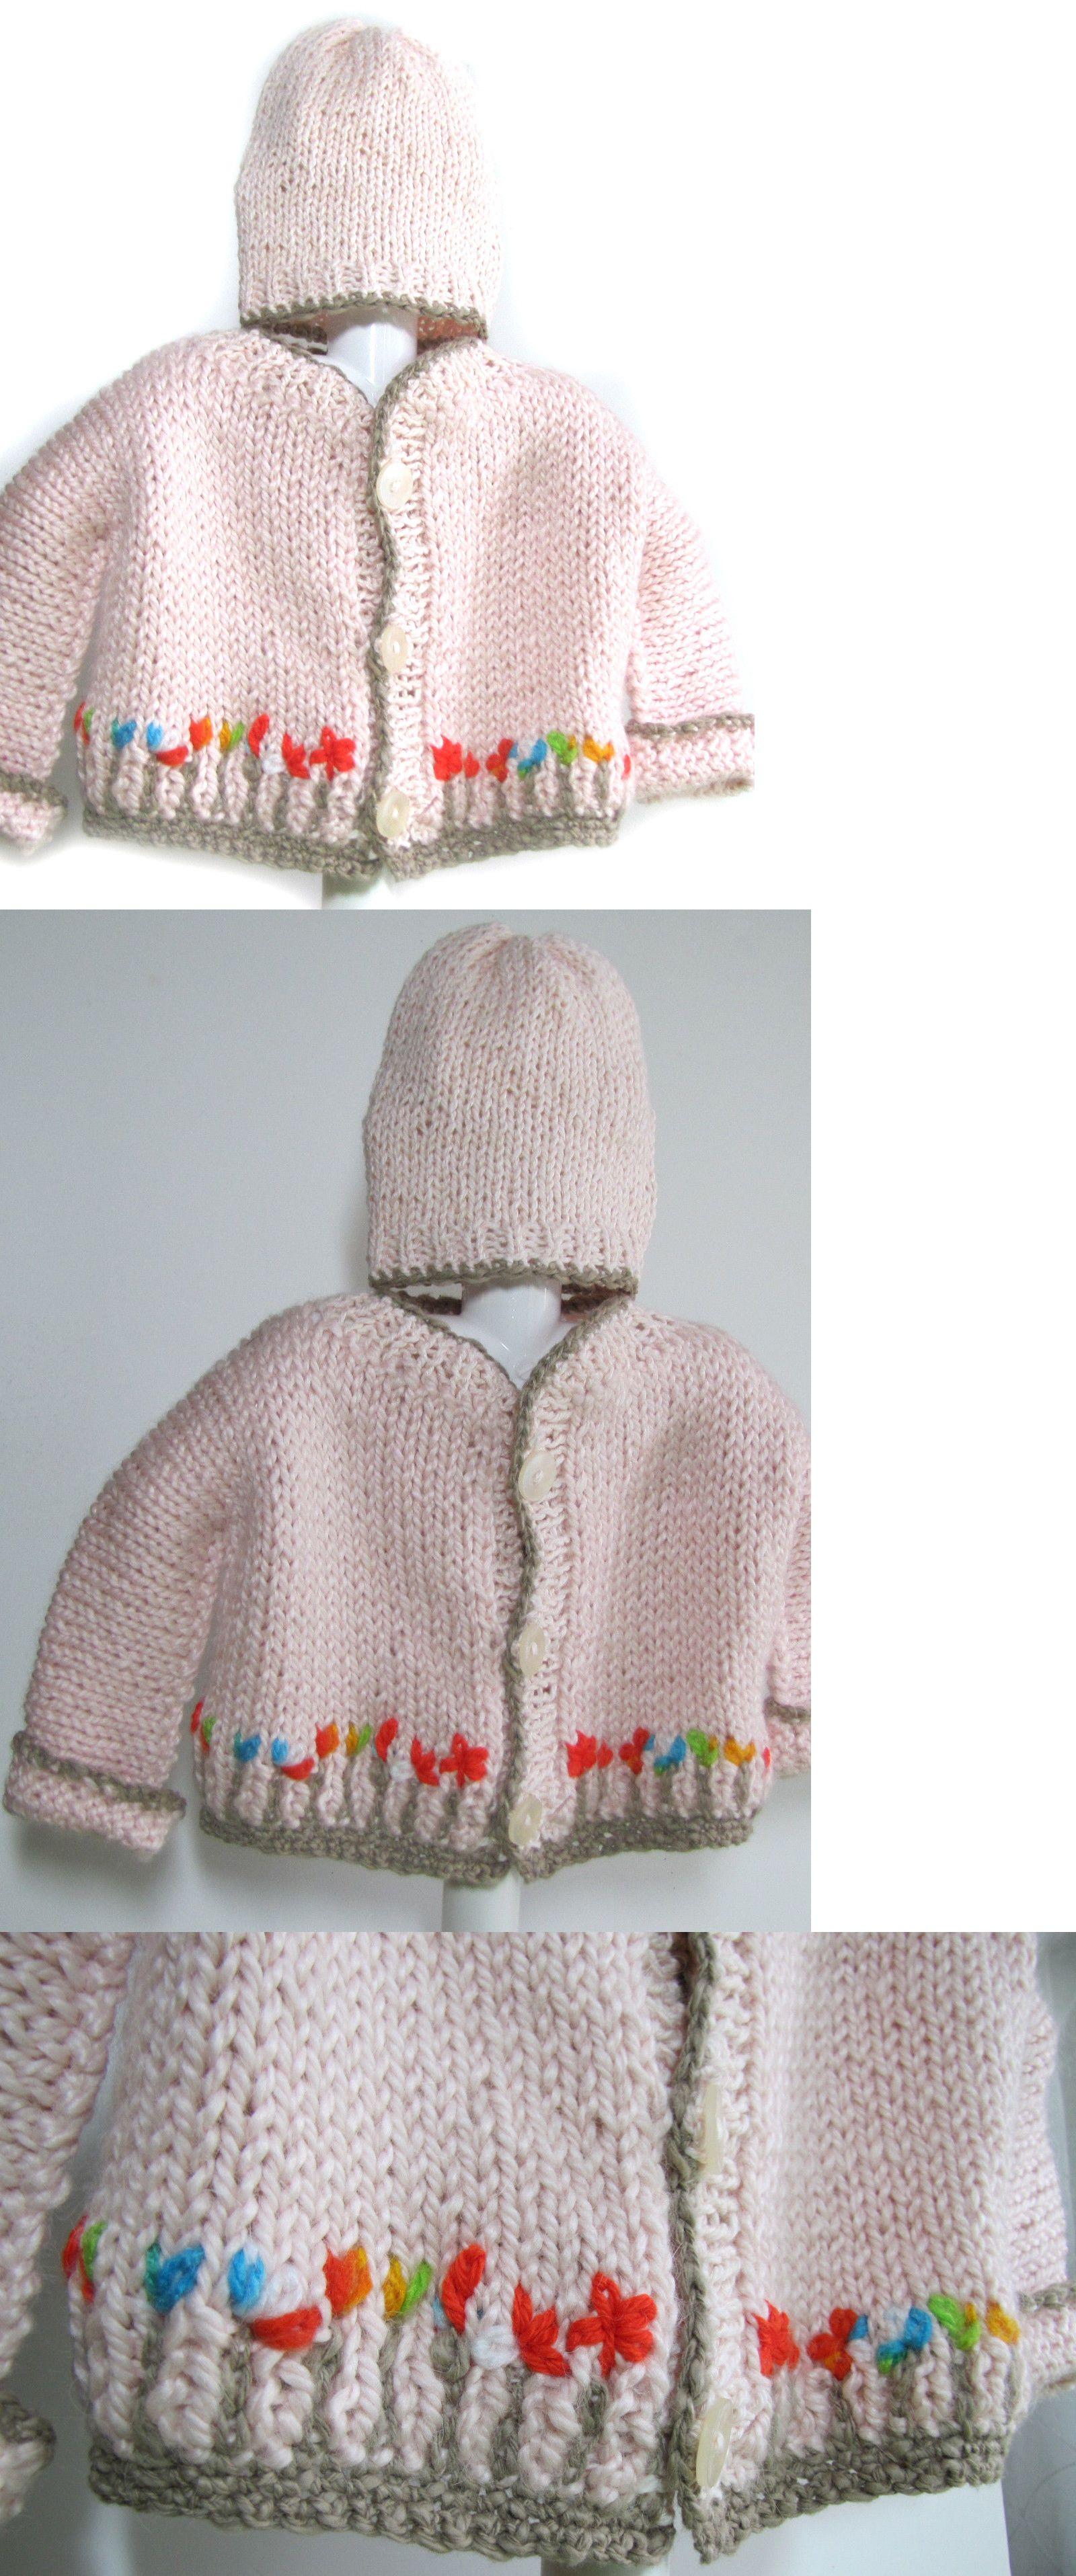 Other Newborn-5T Unisex 57875: New Kss-Sw-090 Handmade Light Pink ...